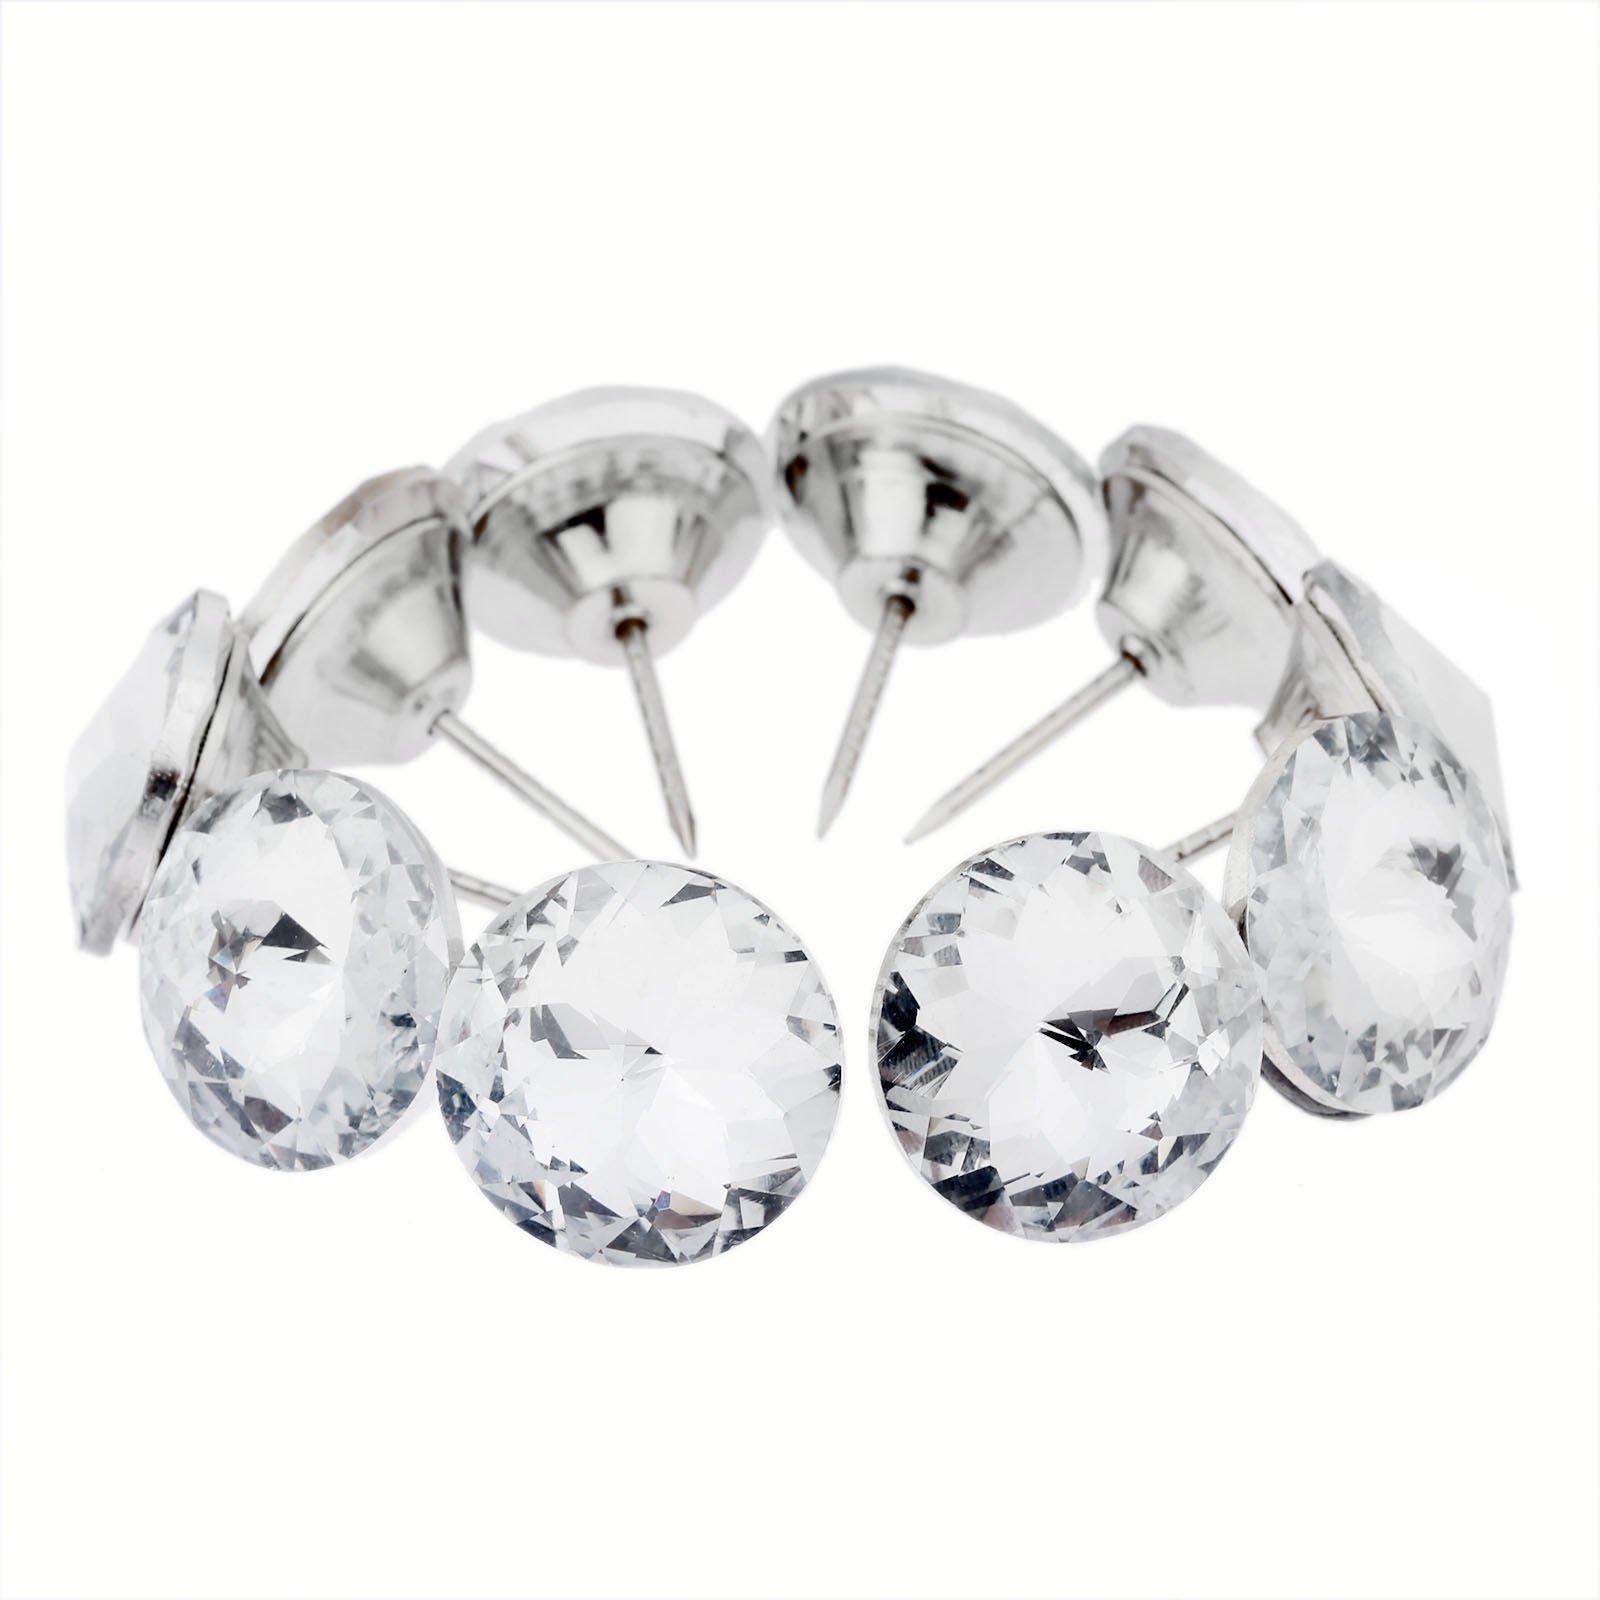 20pcs Diamond Crystal Upholstery Nails Tacks Sofa Headboard Sew Buttons Wall Decor 25mm Dia